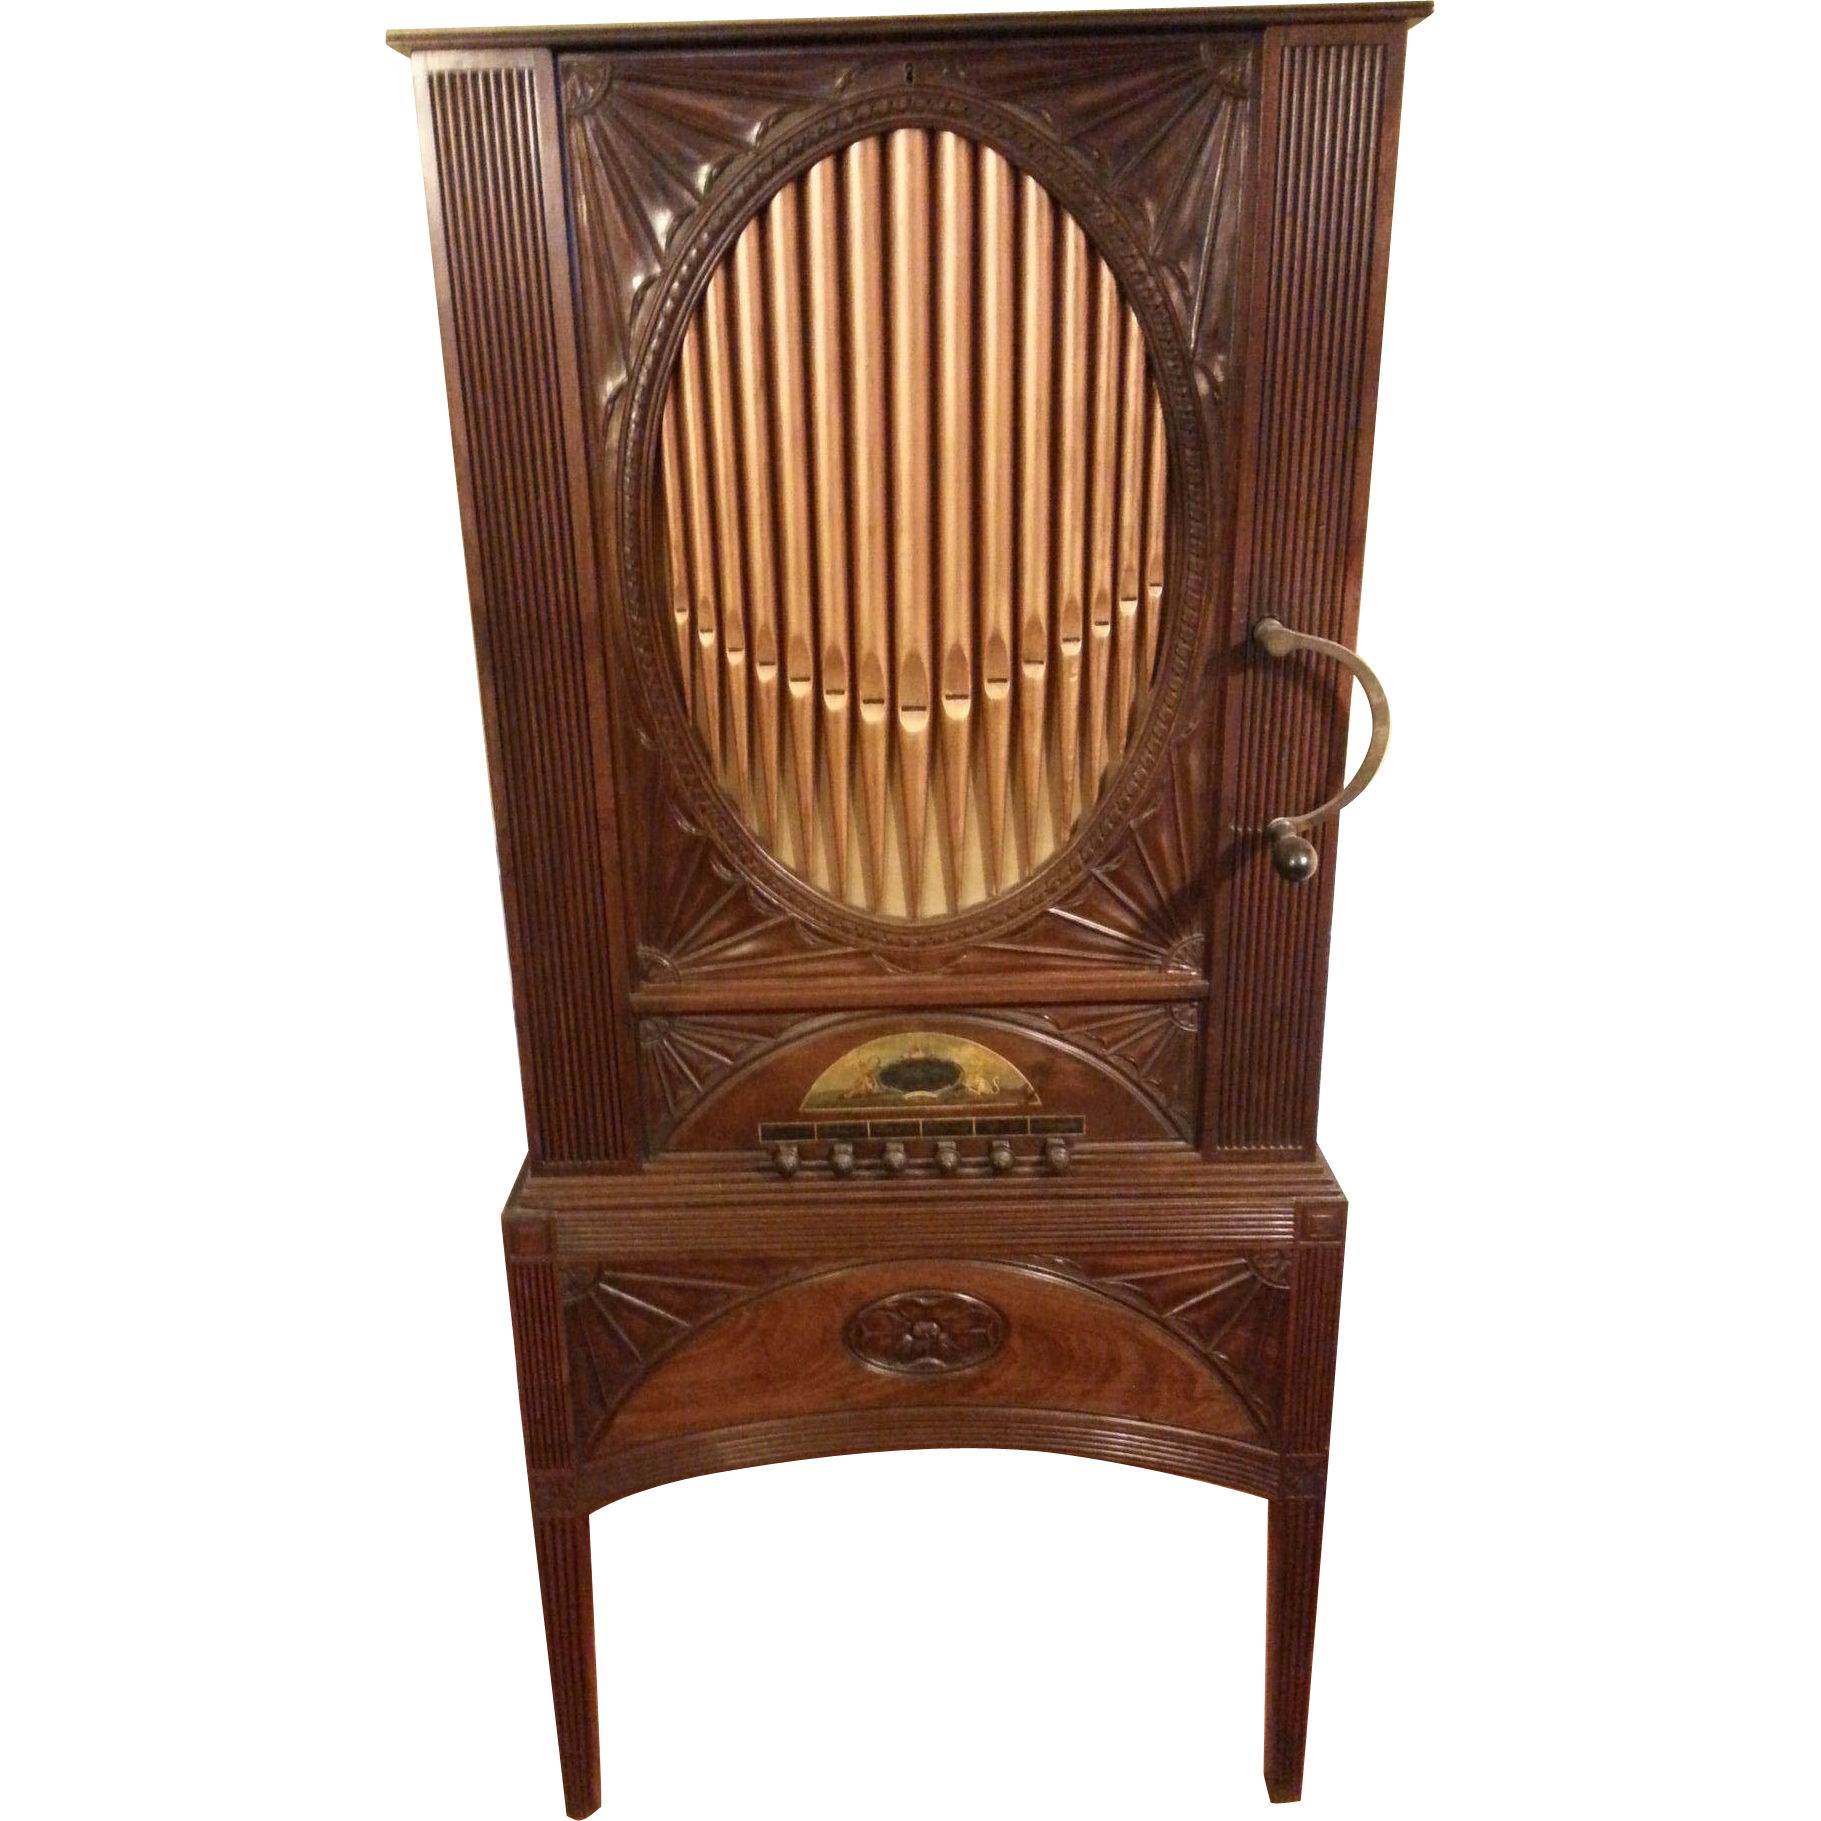 English Domestic Chamber Barrel Organ